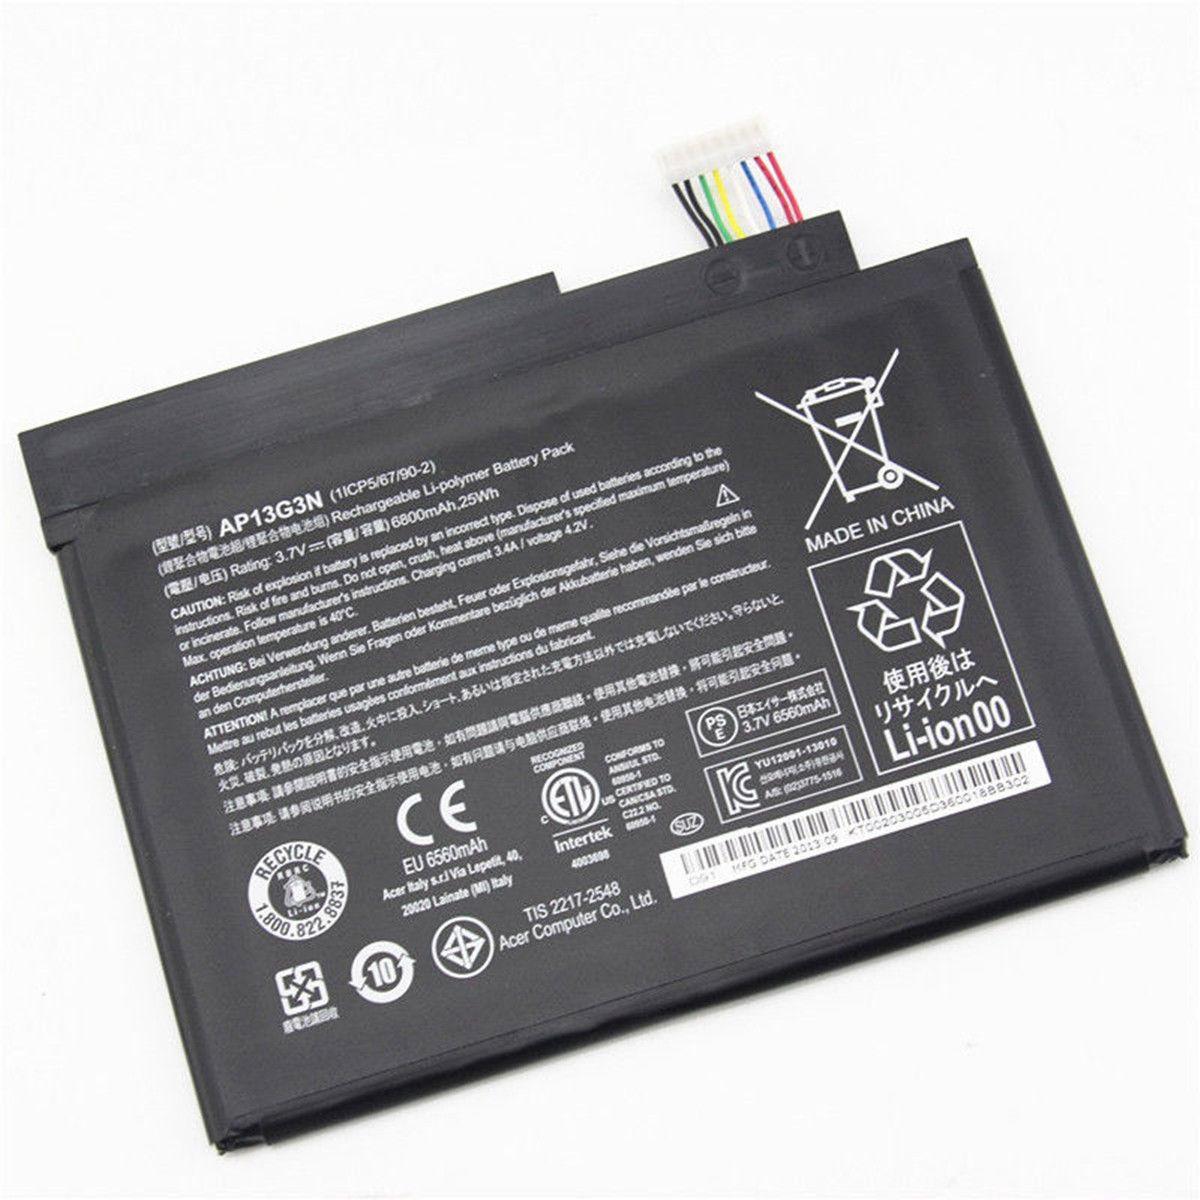 Аккумулятор Acer AP13G3N 3.7V Black 6800mAhr 25Wh Iconia W3-810 Tablet